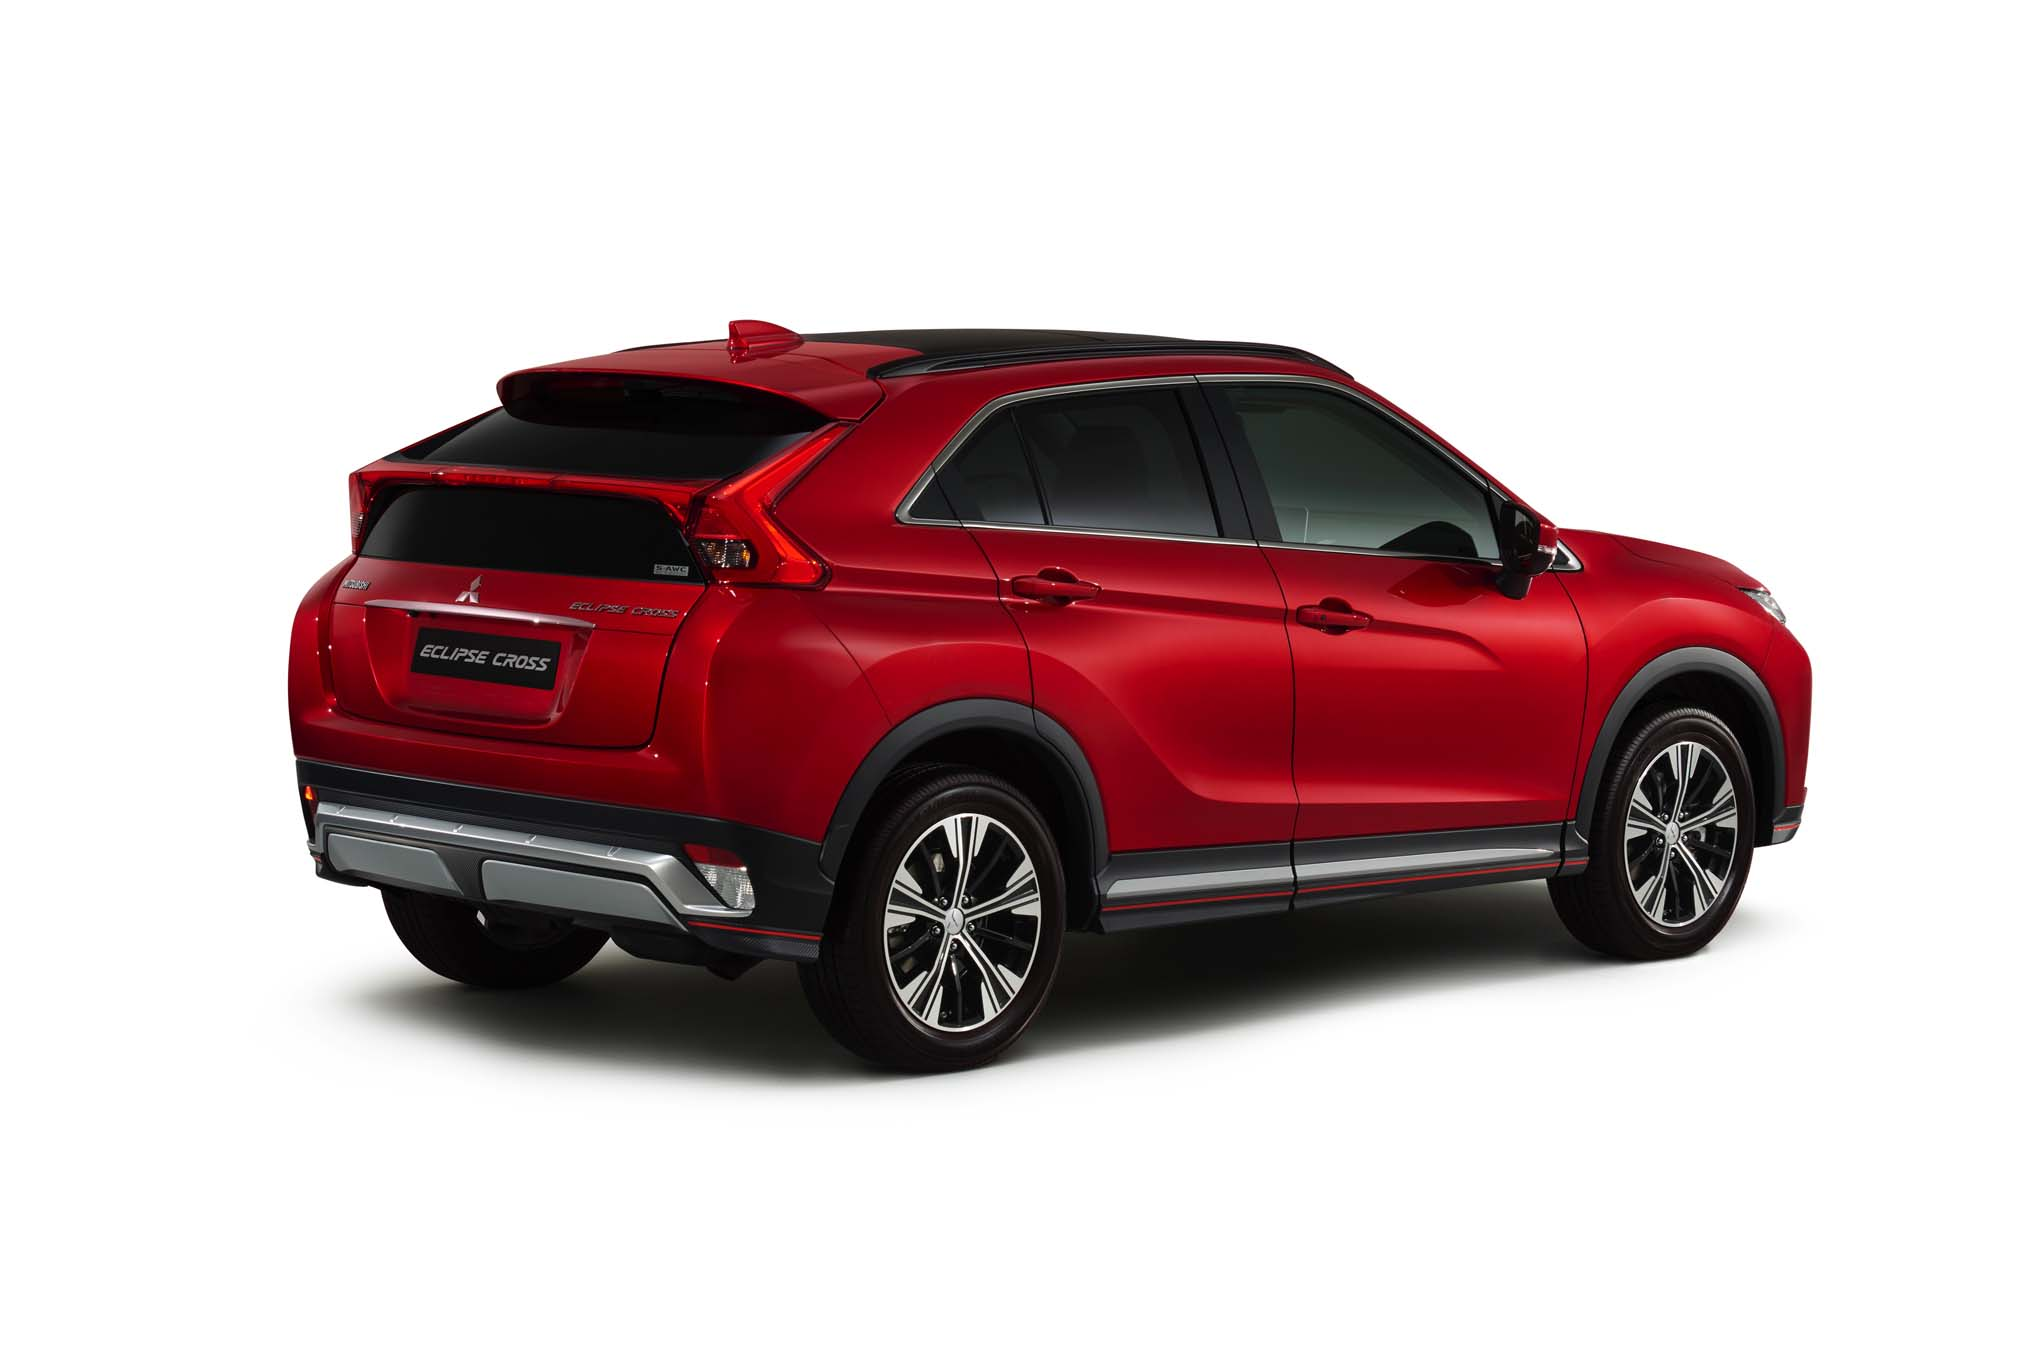 2018 Mitsubishi Eclipse Cross Rear Three Quarter 02 1